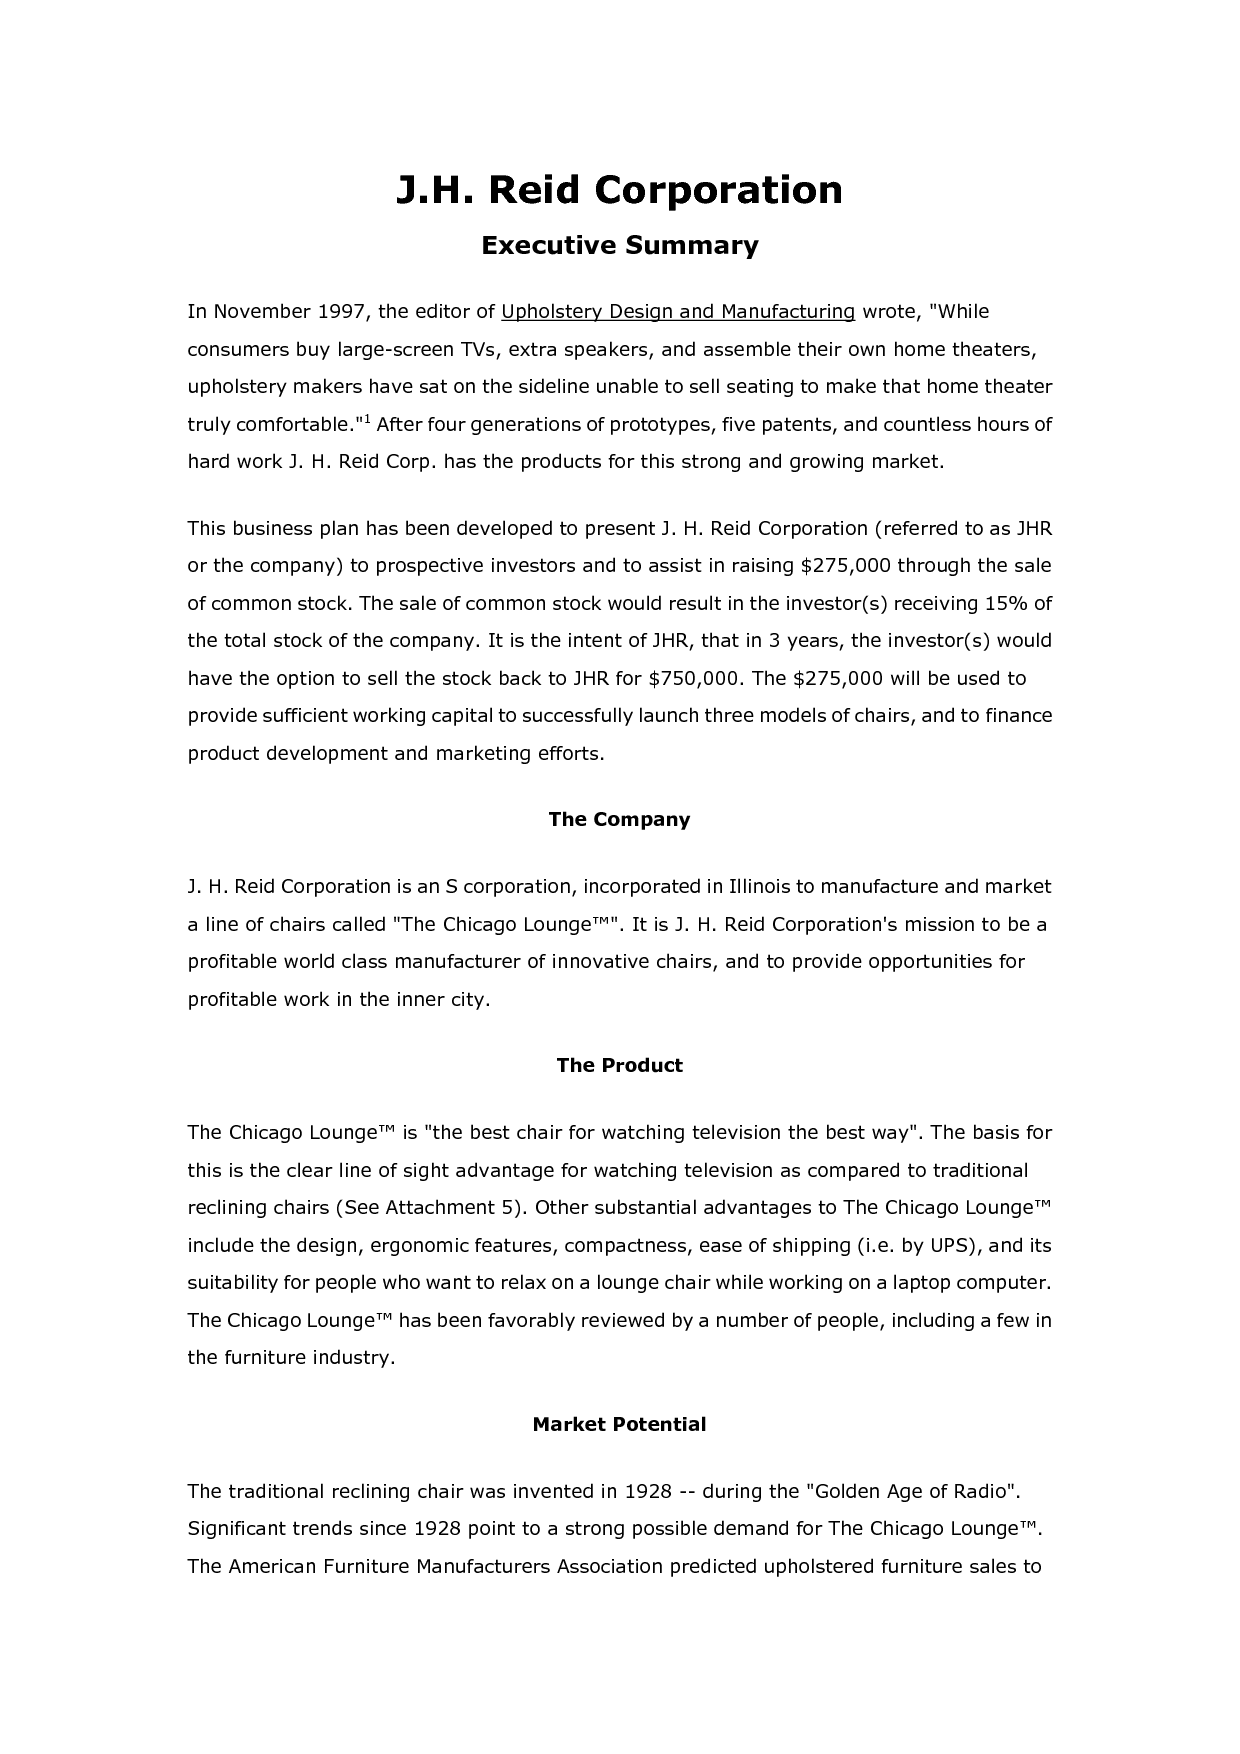 Essay writing service reviews reddit